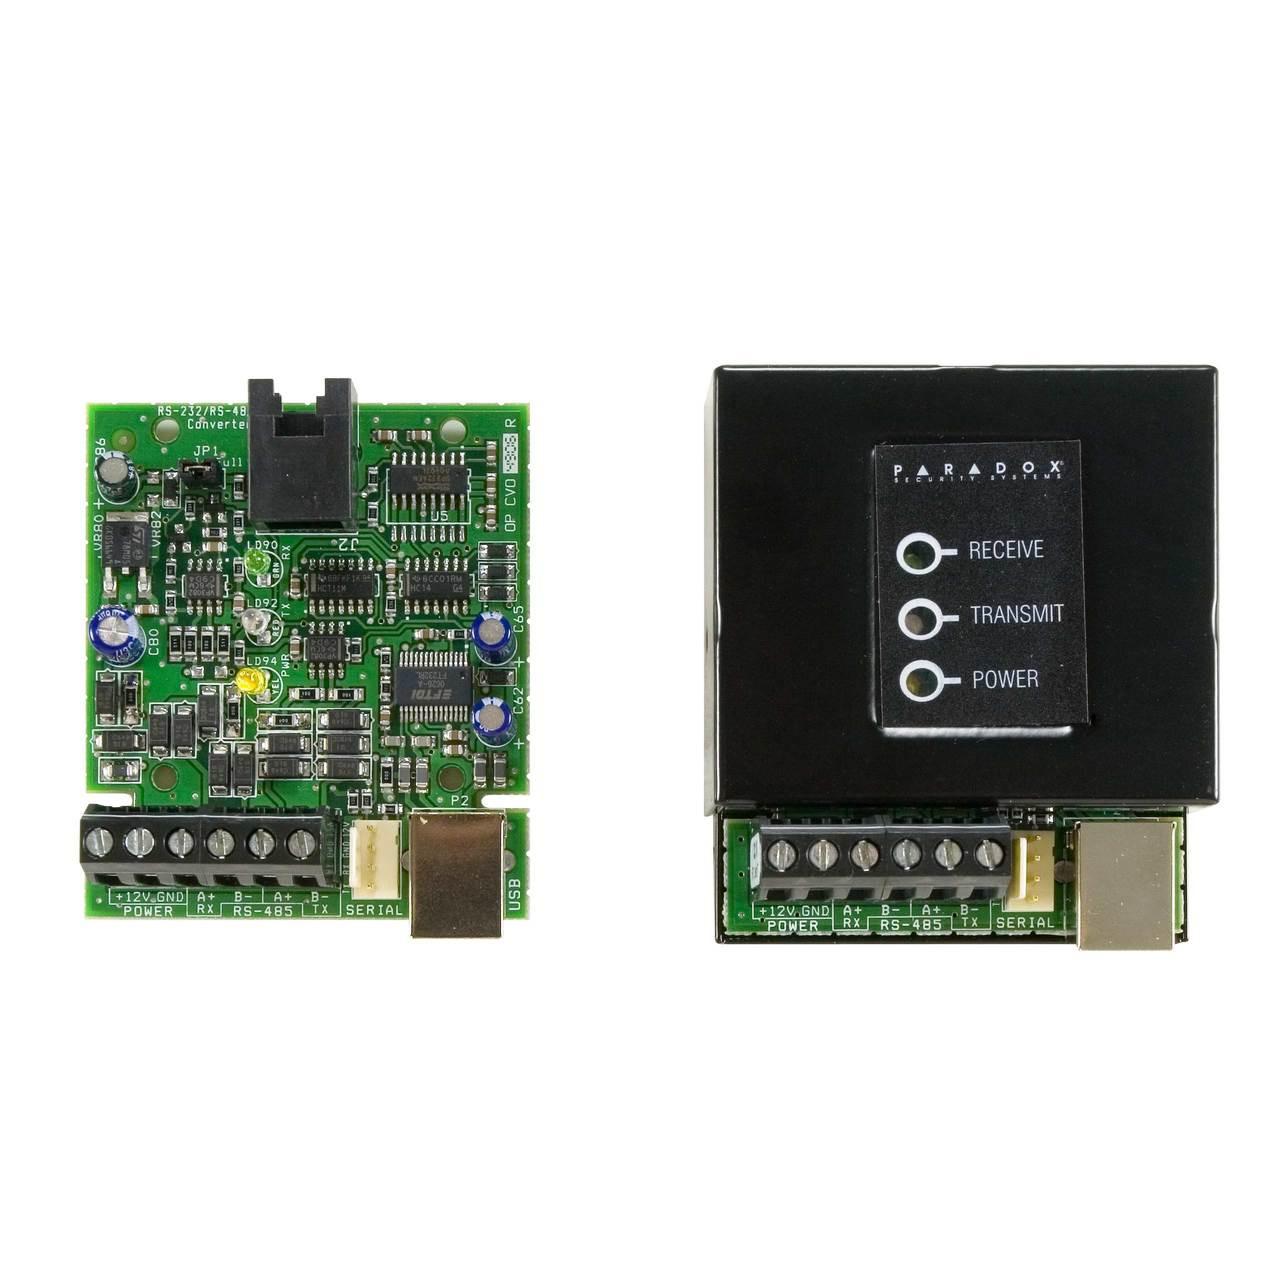 Paradox CV4USB RS-485 / RS-232 Converter Kit